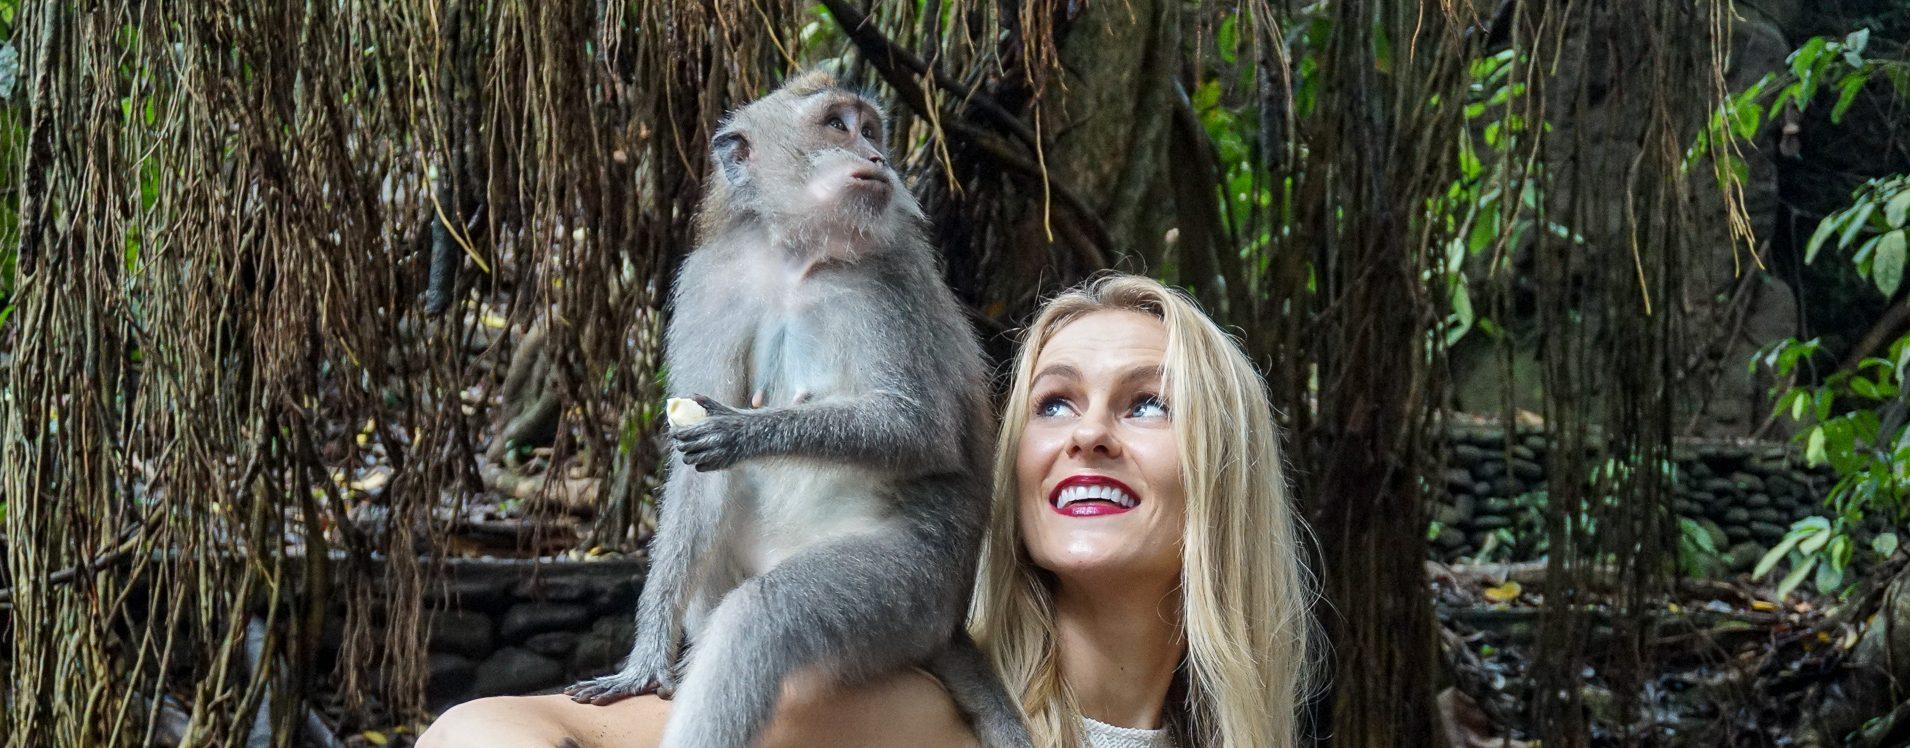 Hasil gambar untuk ubud monkey forest bali